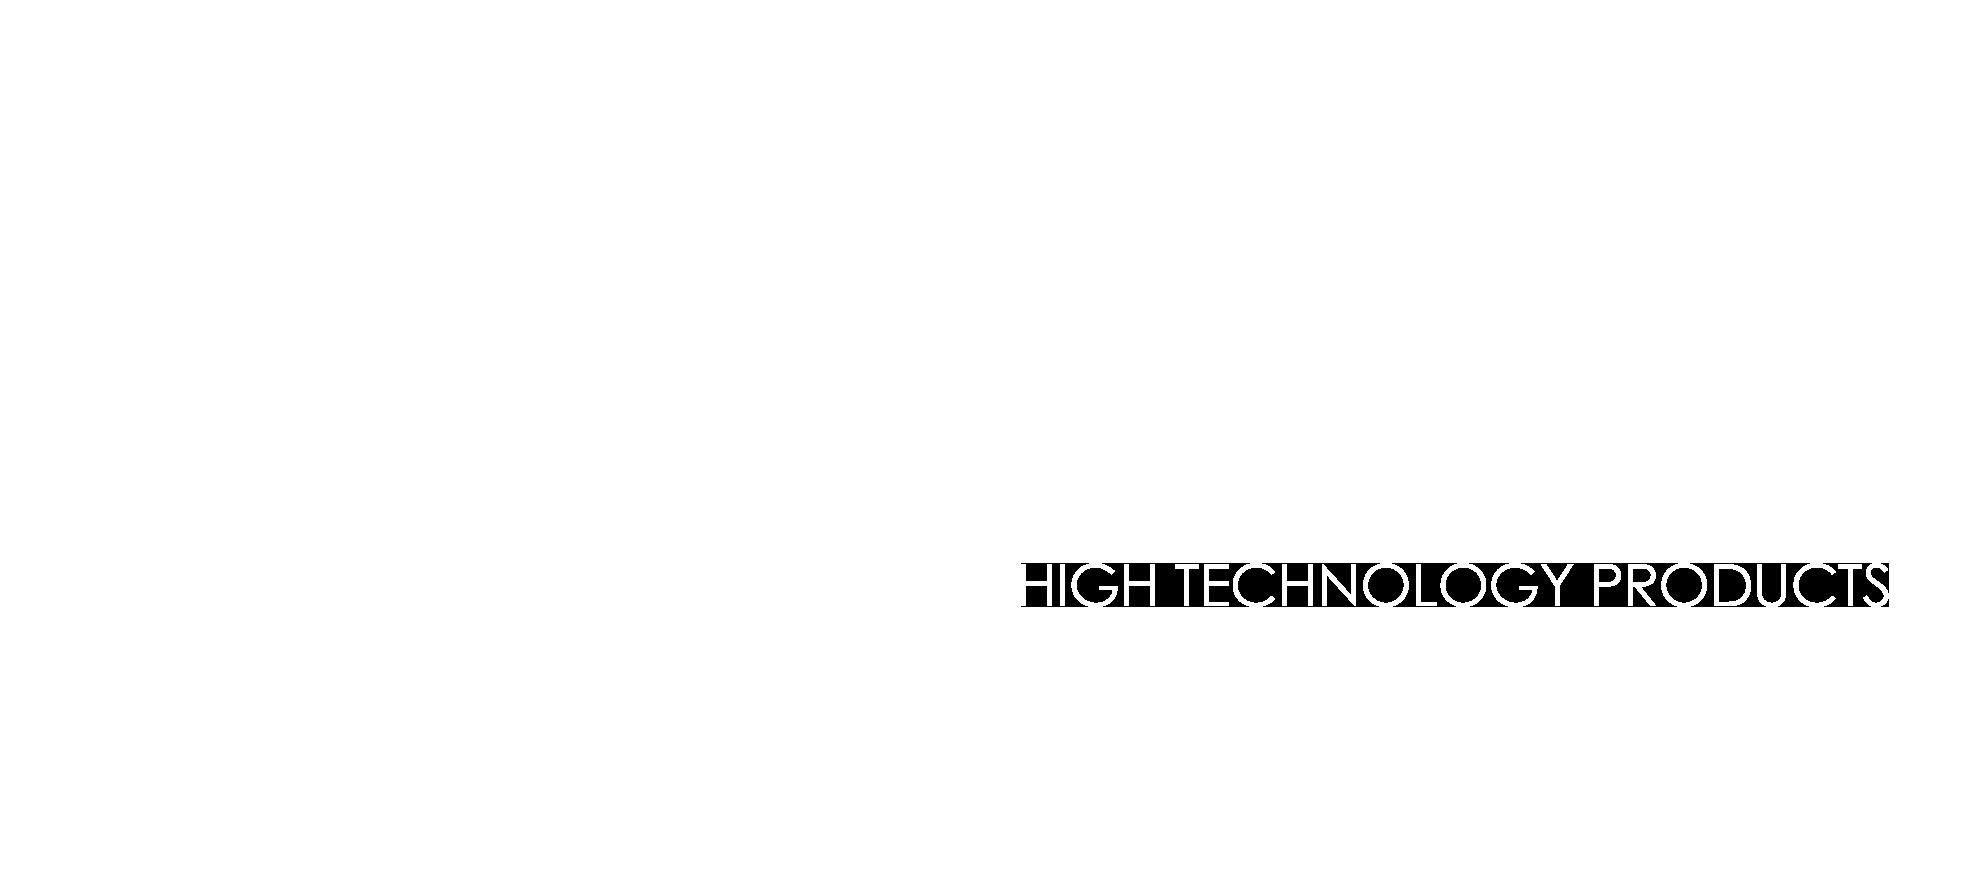 Savvas Rolex Ltd